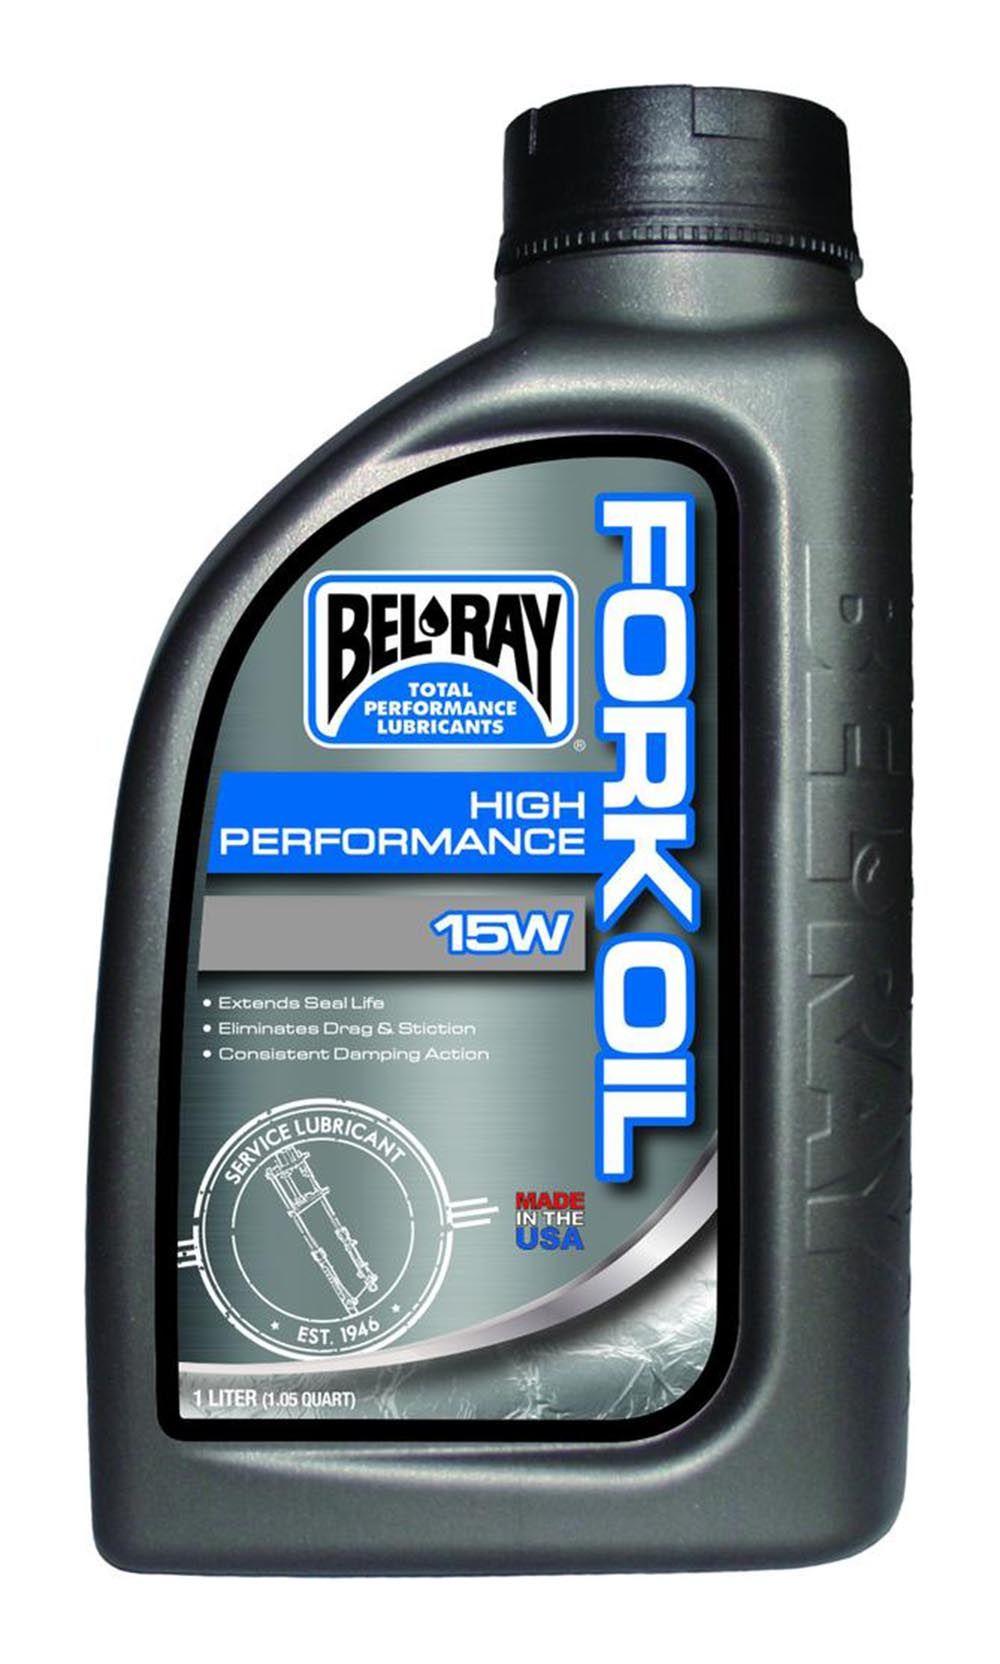 Bel-Ray High Performance Fork Oil 15W (1 Liter)